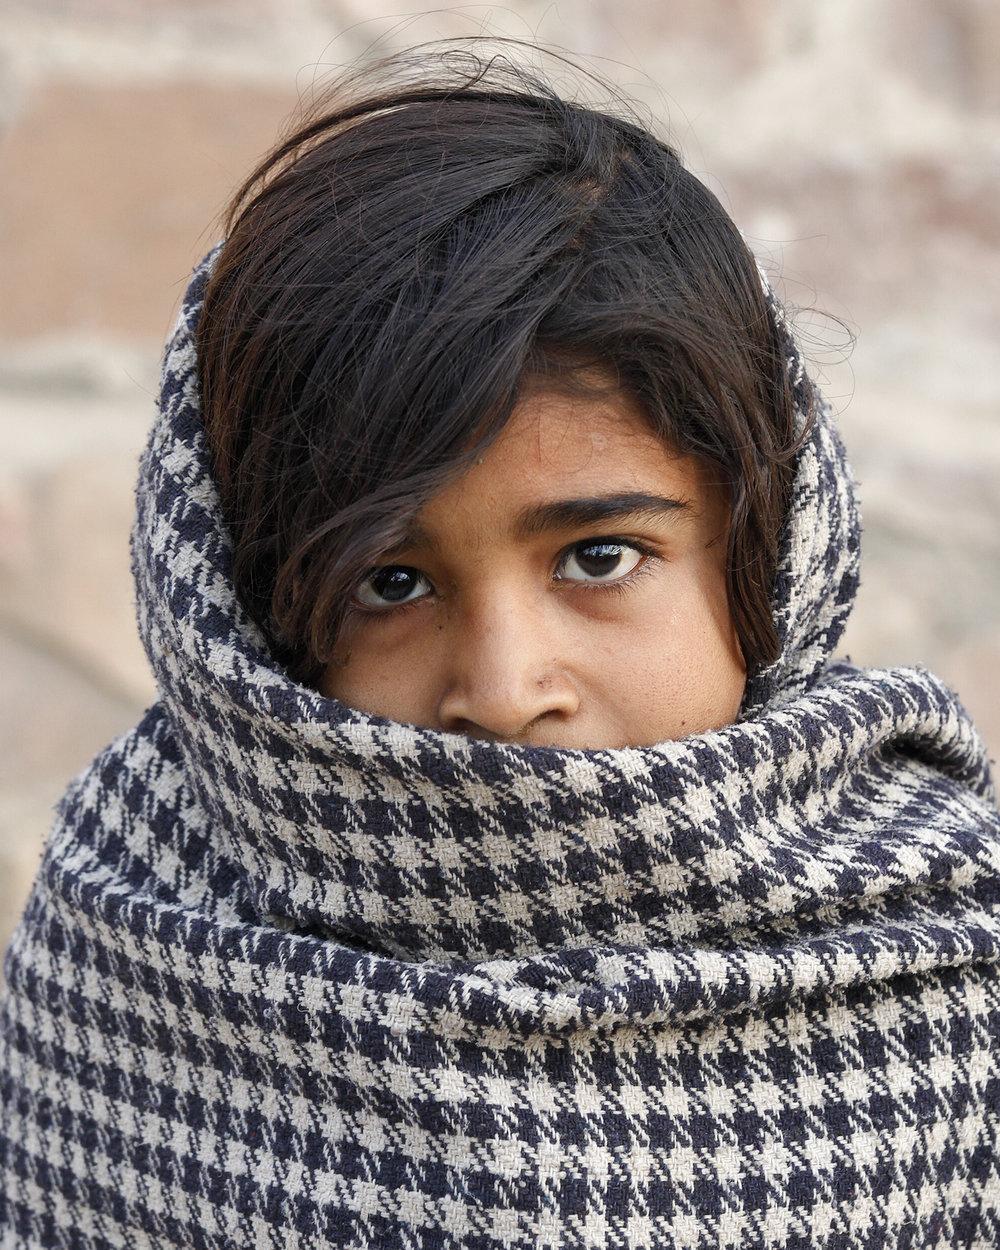 Brian_Jones_Women of India_Women of India - Rajasthan 1_1.jpg